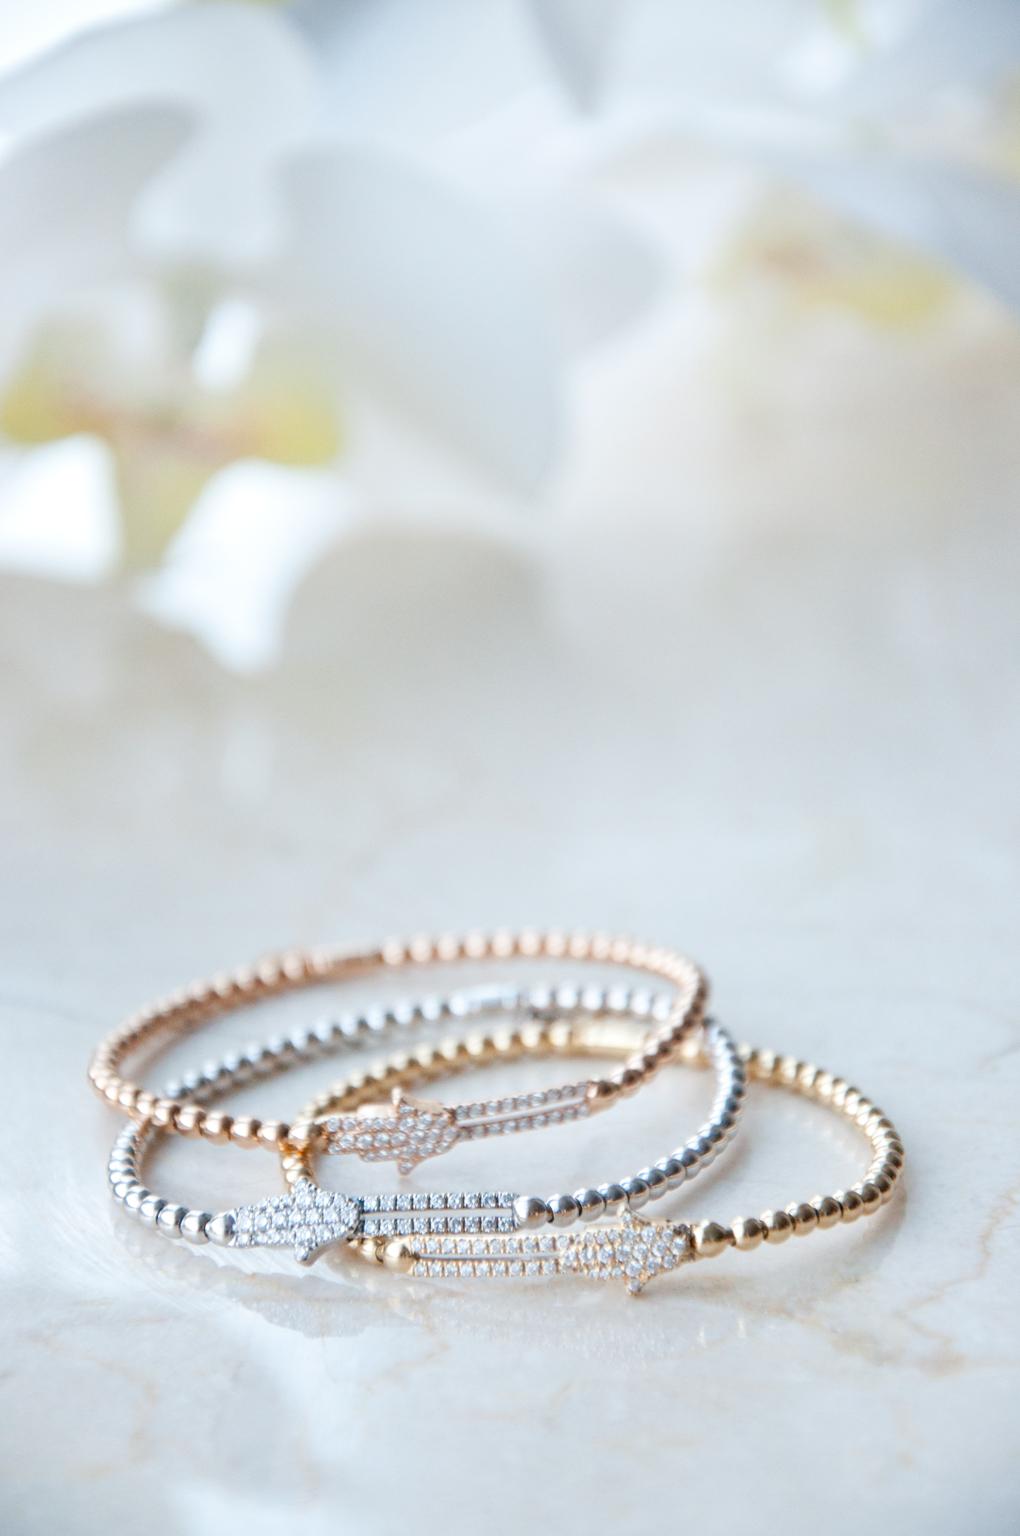 Lyla_Loves_Fashion_Hulchi_Belluni_Bracelets_6368